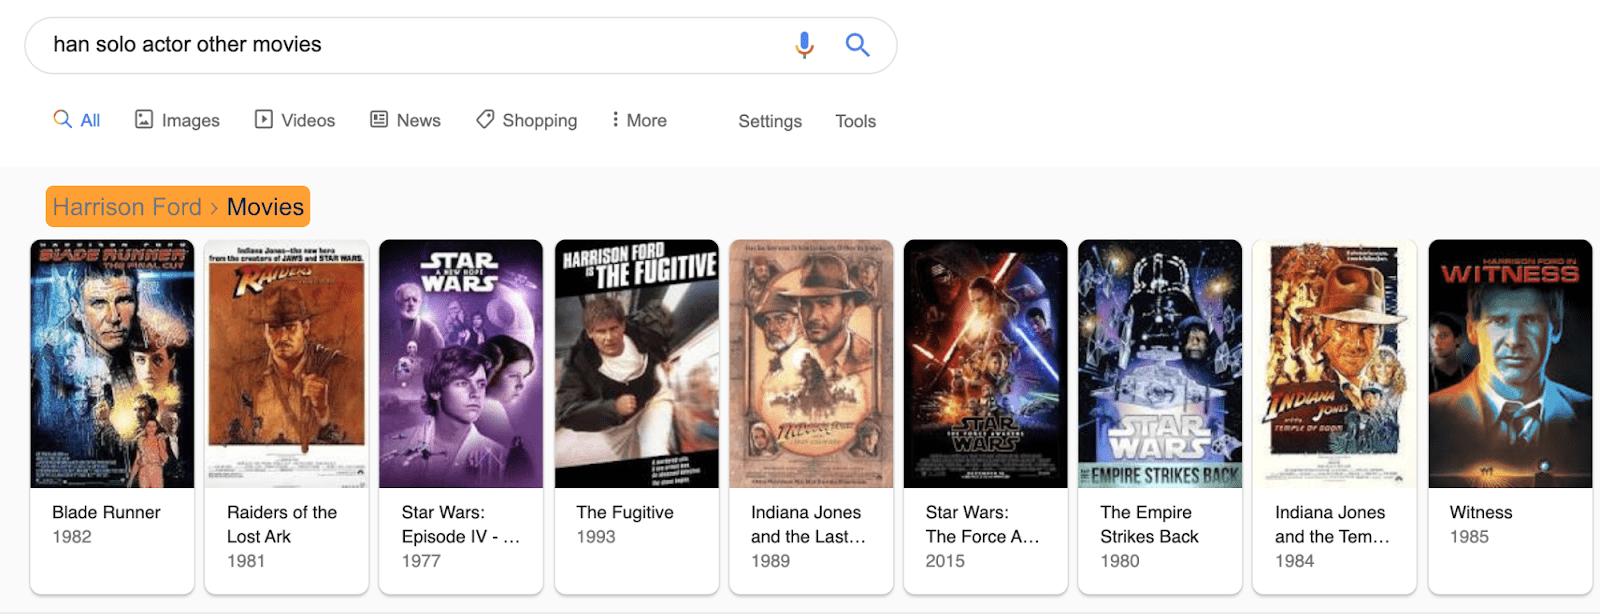 1 film han solo 1